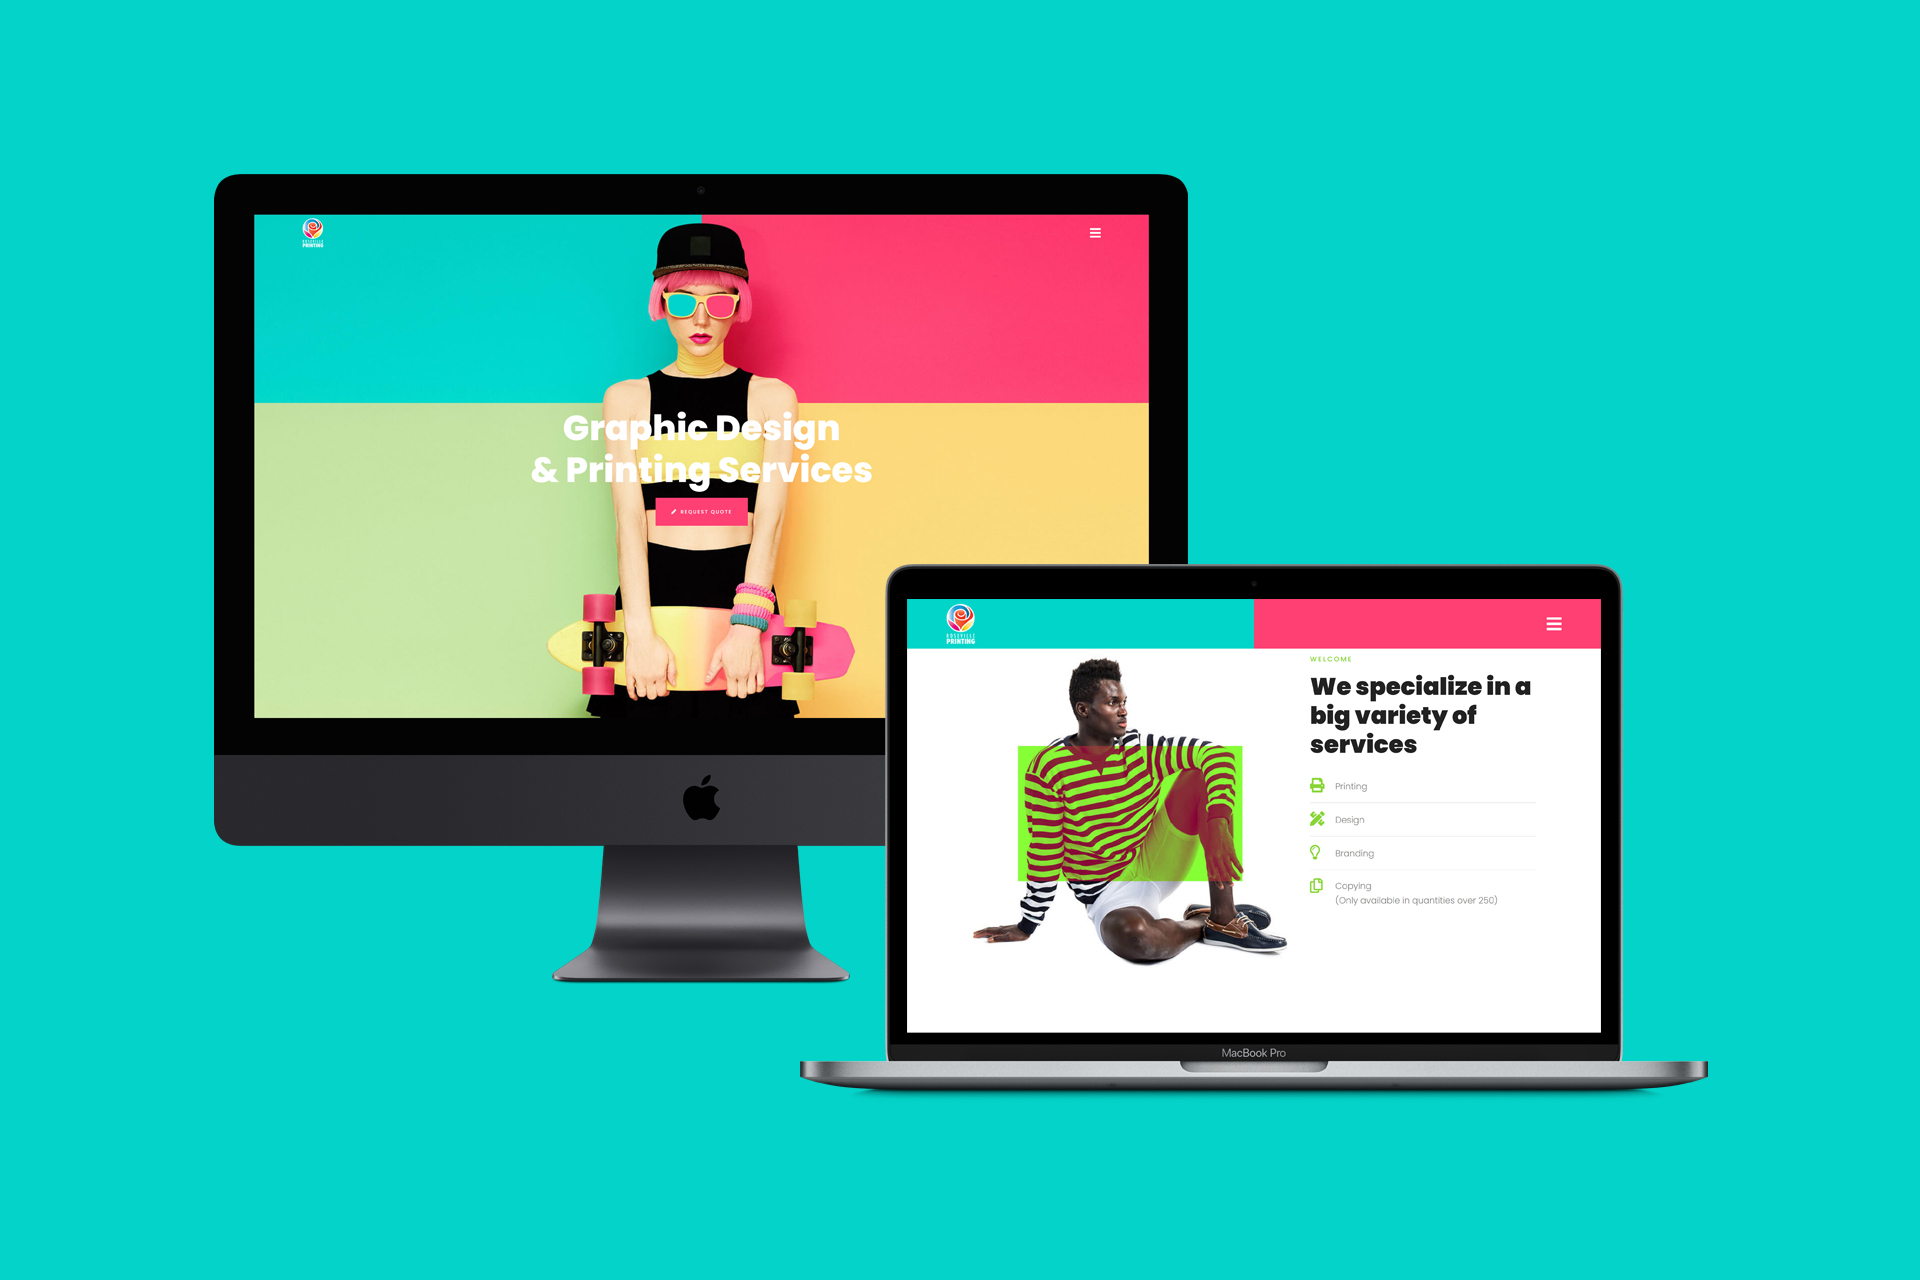 Graphic Design & Printing Company Website | WordPress Web Design and Development | E'finit Media San Antonio